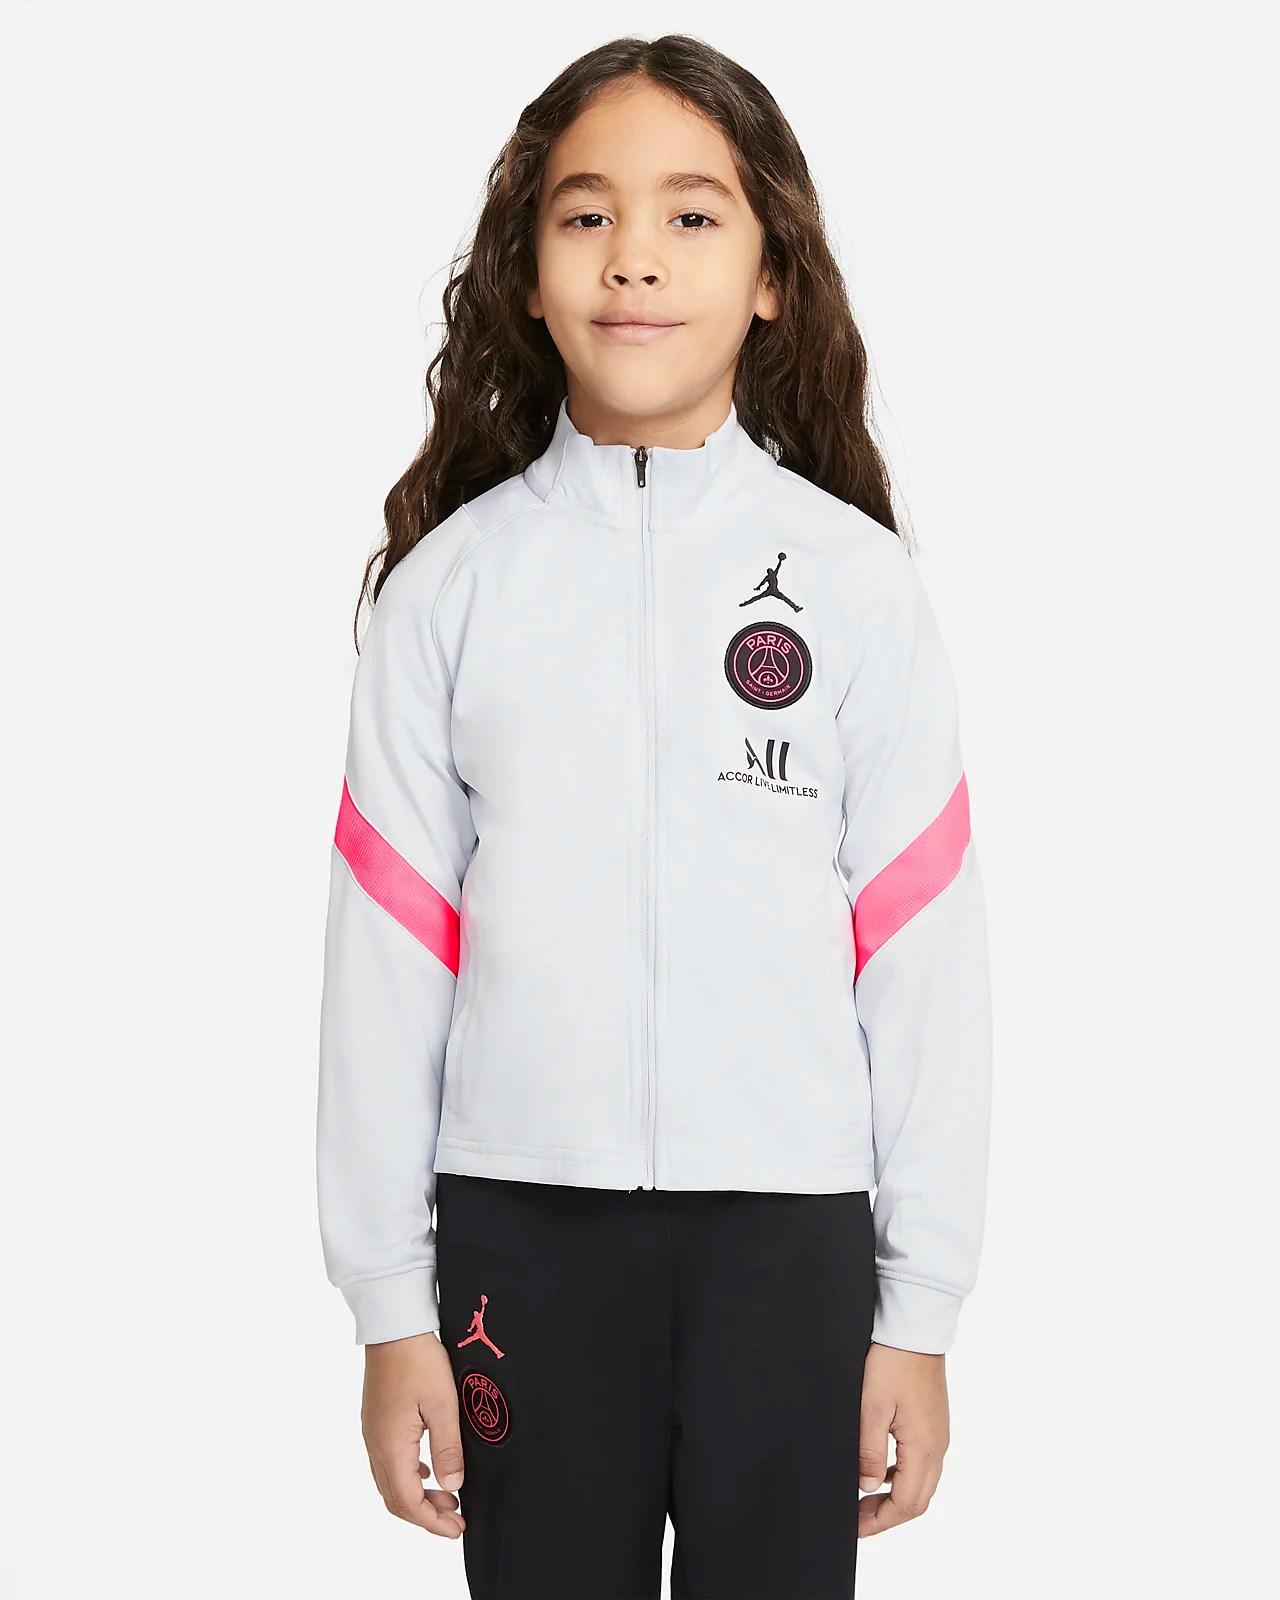 paris saint germain strike fussball trainingsanzug fur jungere kinder